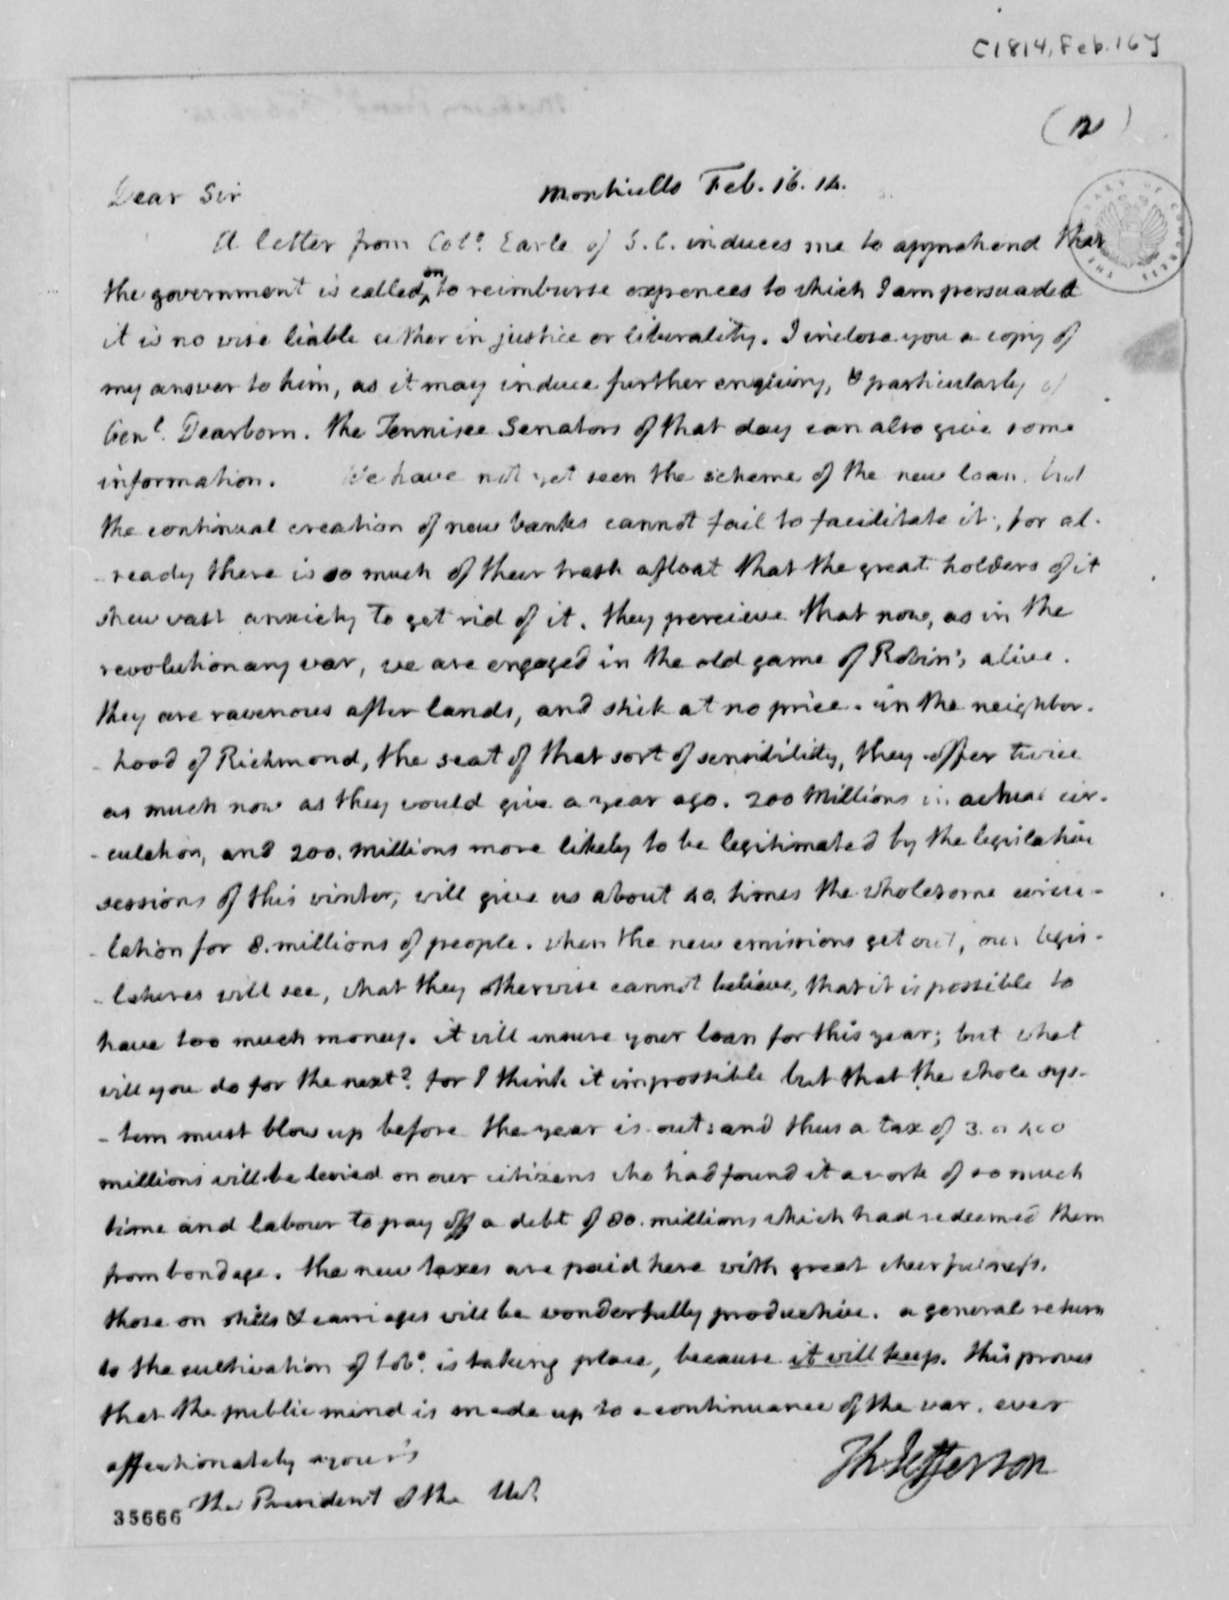 Thomas Jefferson to James Madison, February 16, 1814